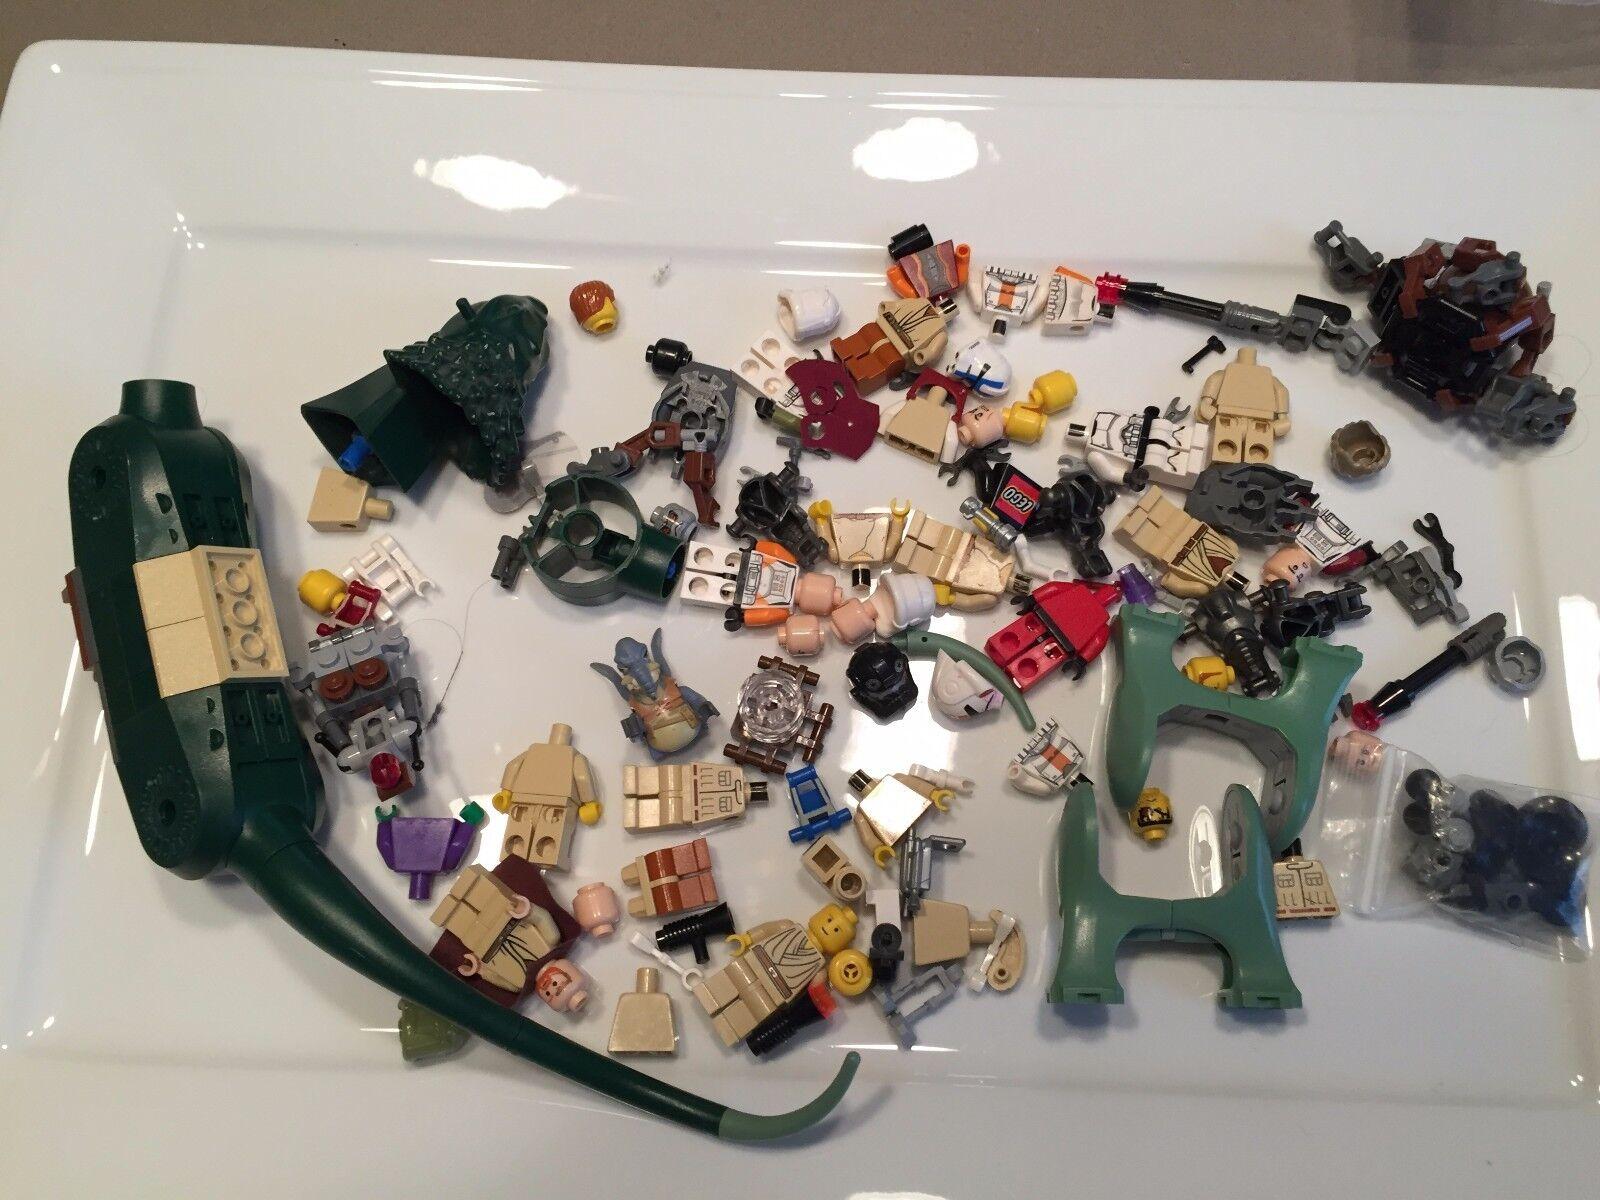 8 Ounces Lego estrella guerras Minifig  parts Boga 1 2 Pound minicifras Lot S338  risparmia il 50% -75% di sconto